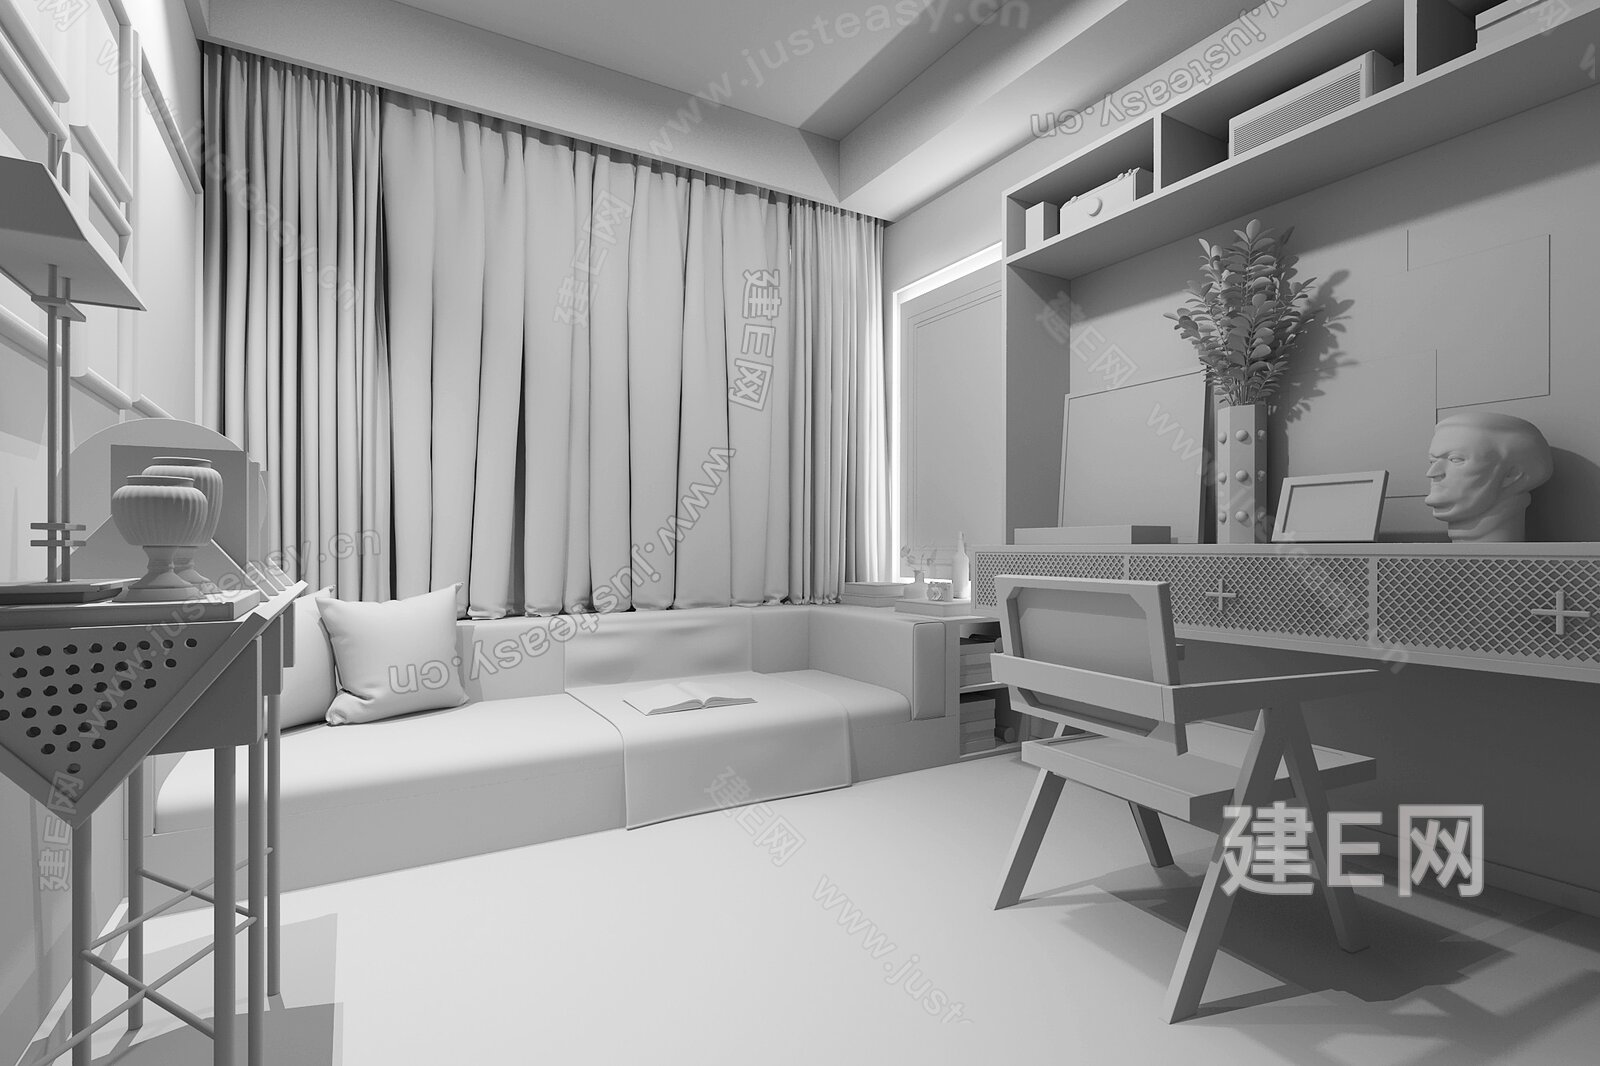 IF DESIGN 羽果设计 融汇中西美学的艺术演绎 现代书房3d模型